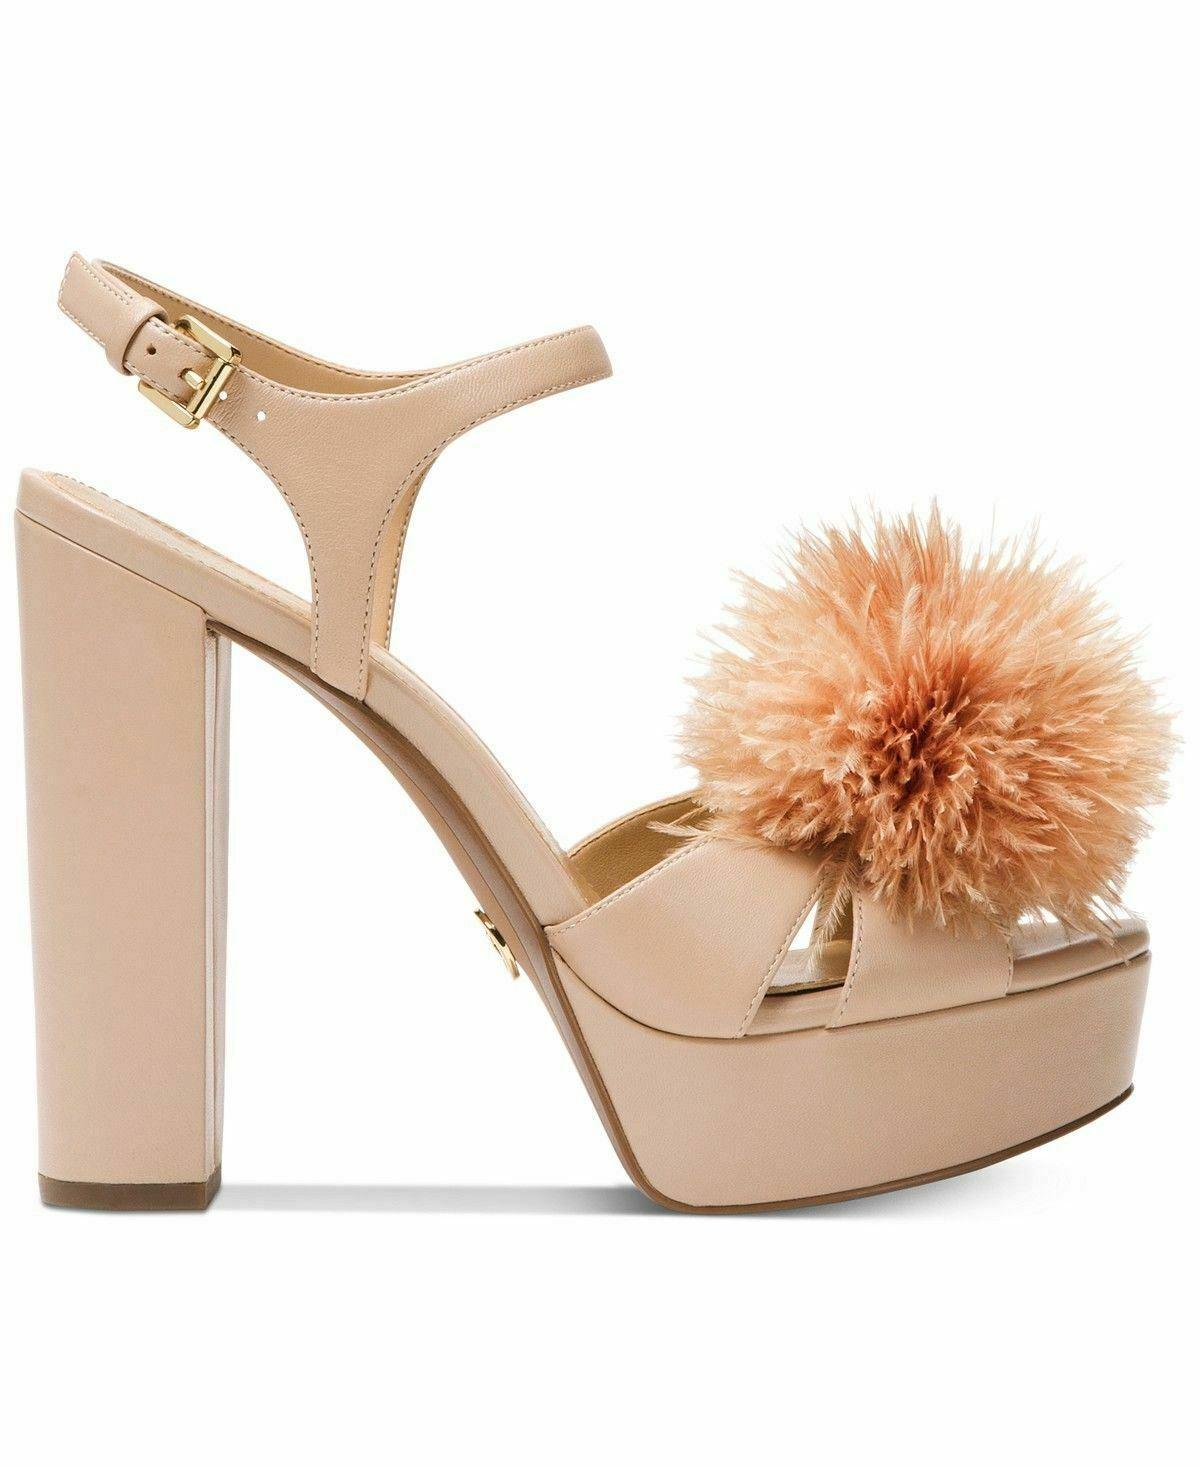 MICHAEL Michael Kors womens Fara Platform Sandals size 9M Color Oyster heels NWB image 4